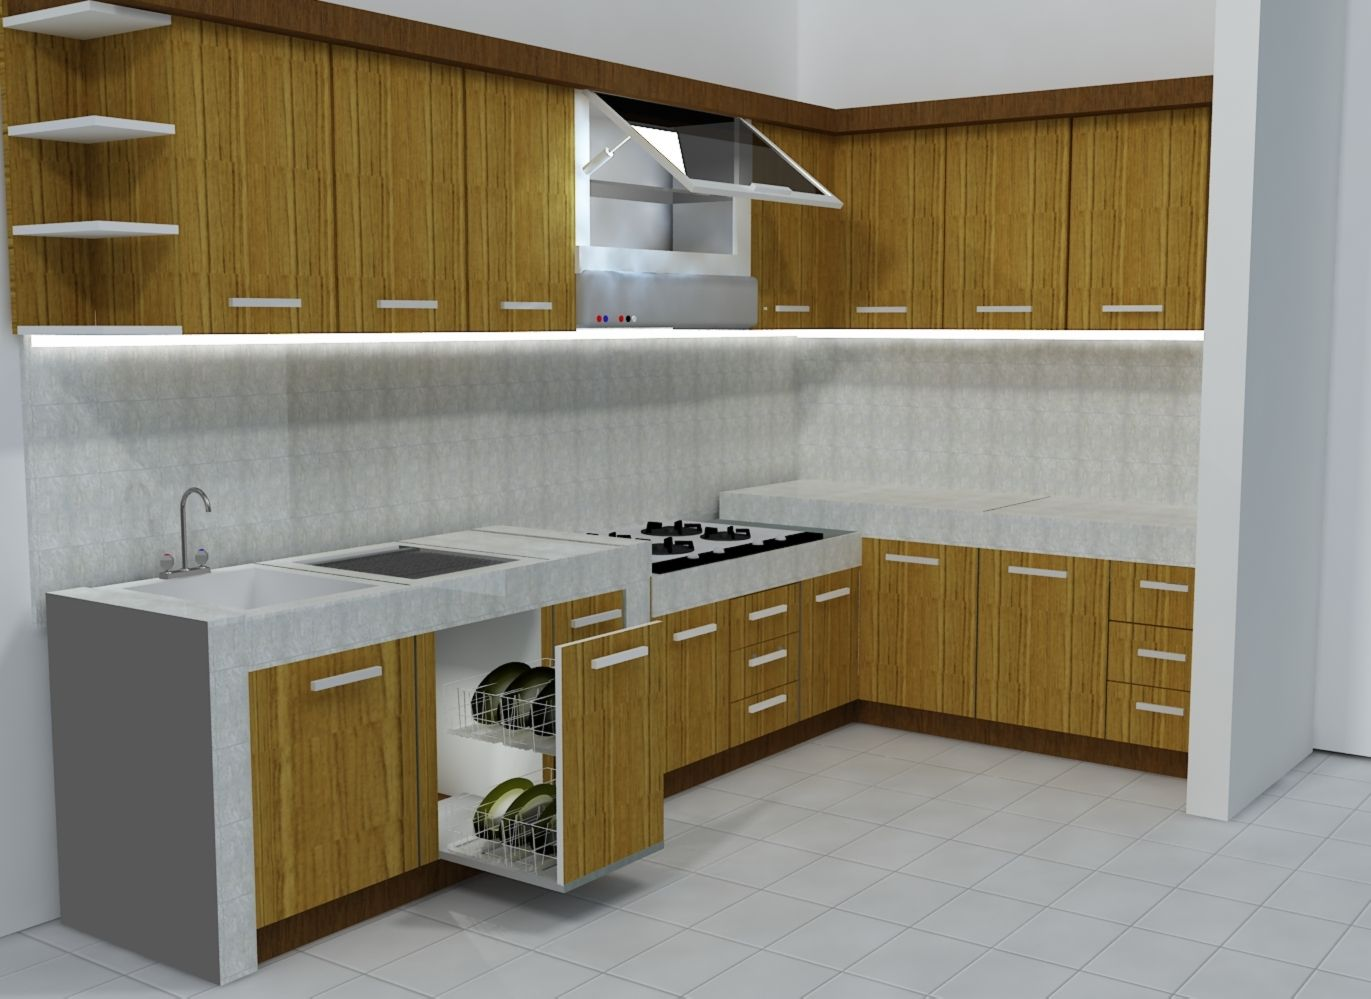 Design Kitchen Set Untuk Dapur Kecil Harga & 70 Model Gambar Kitchen Set Minimalis  Kitchen Set Ideas